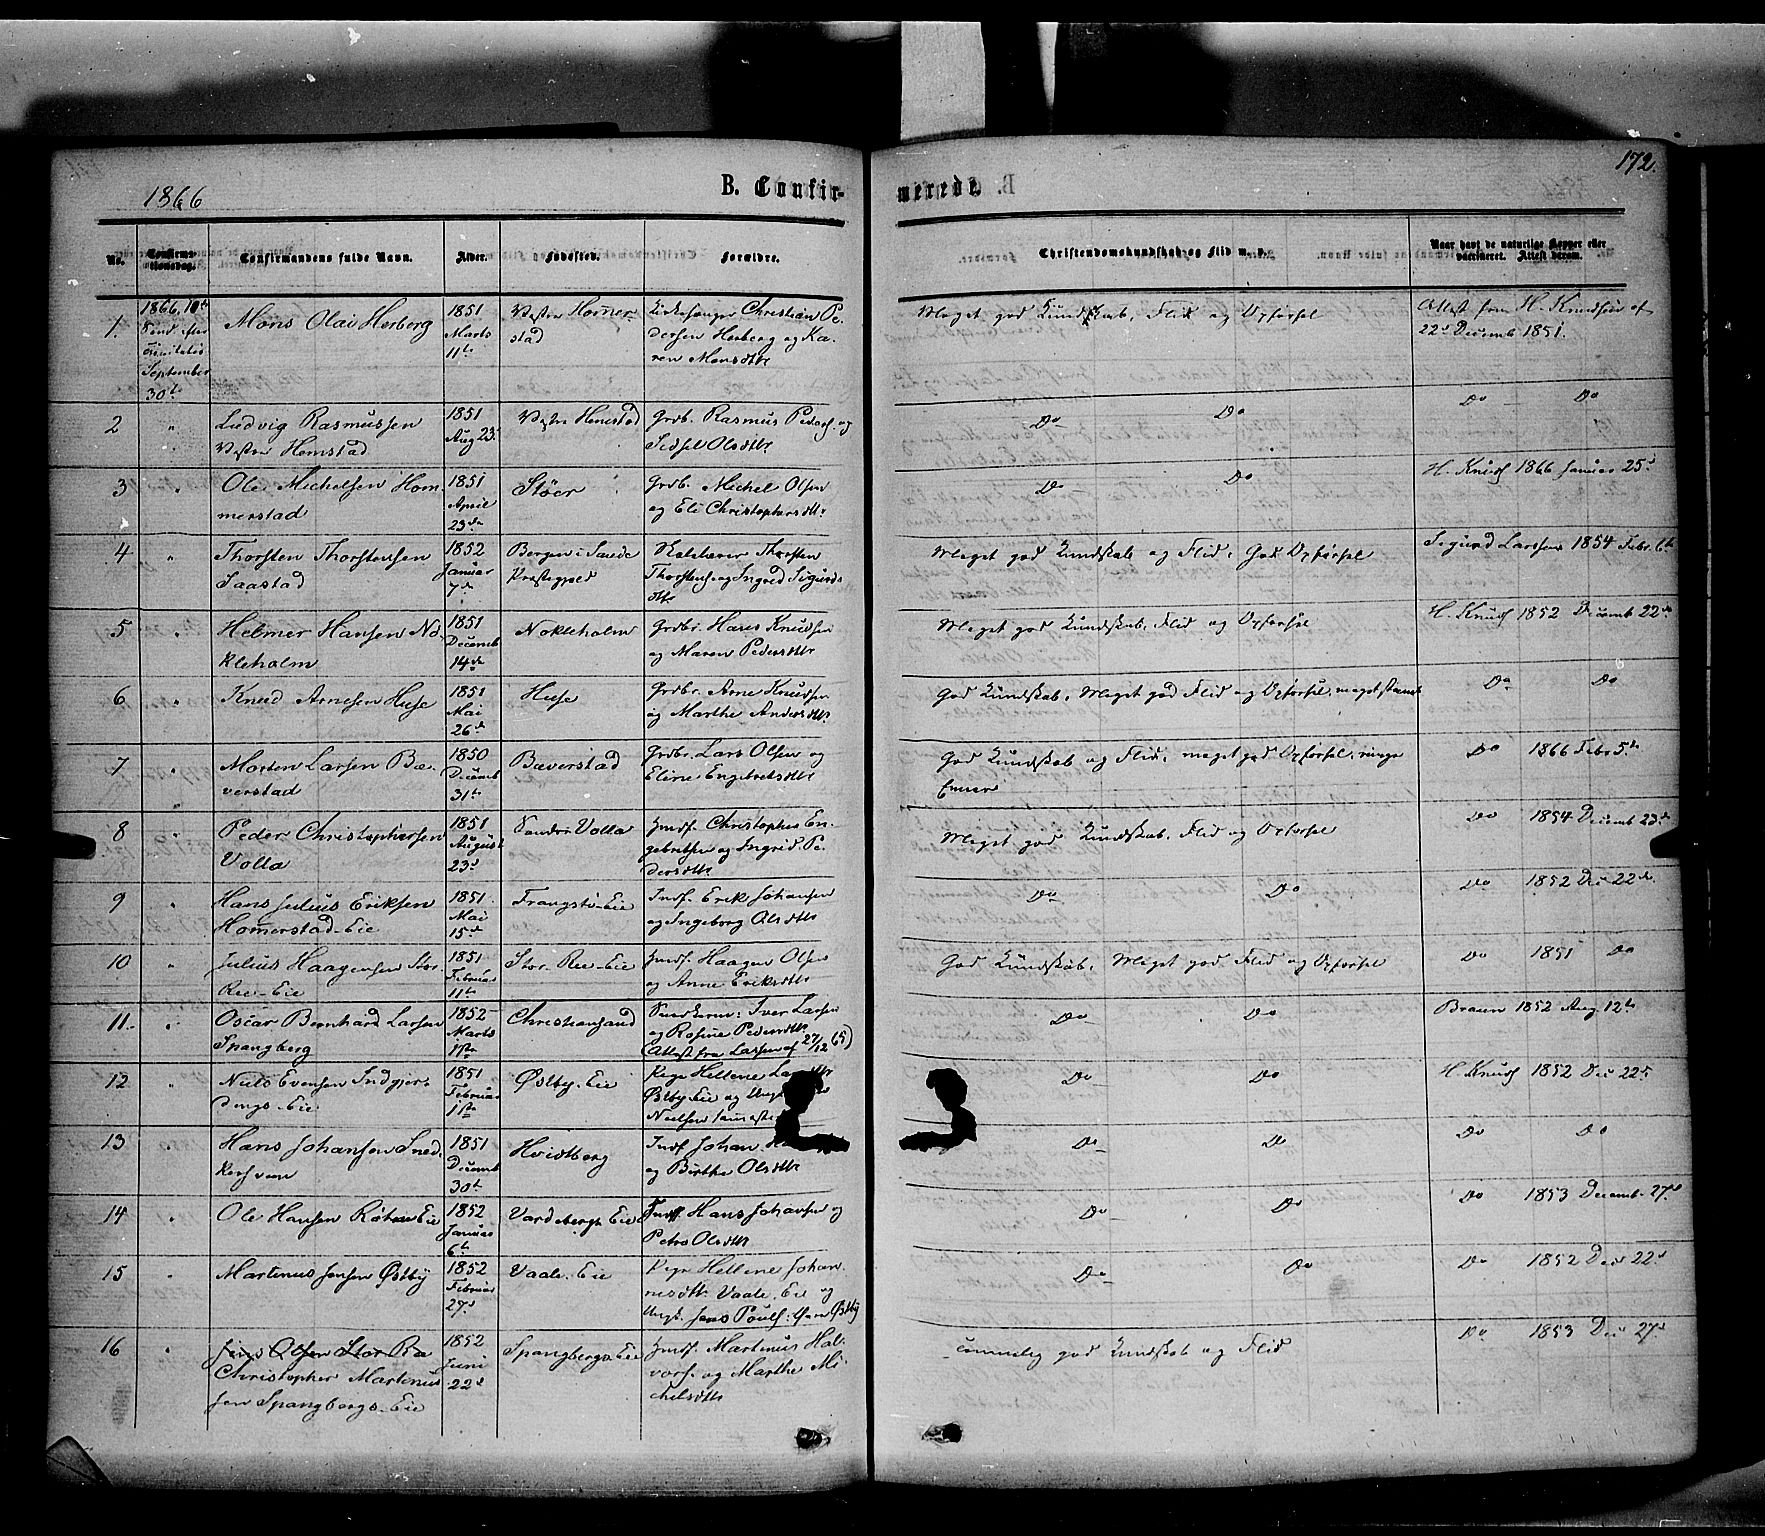 SAH, Stange prestekontor, K/L0013: Ministerialbok nr. 13, 1862-1879, s. 172